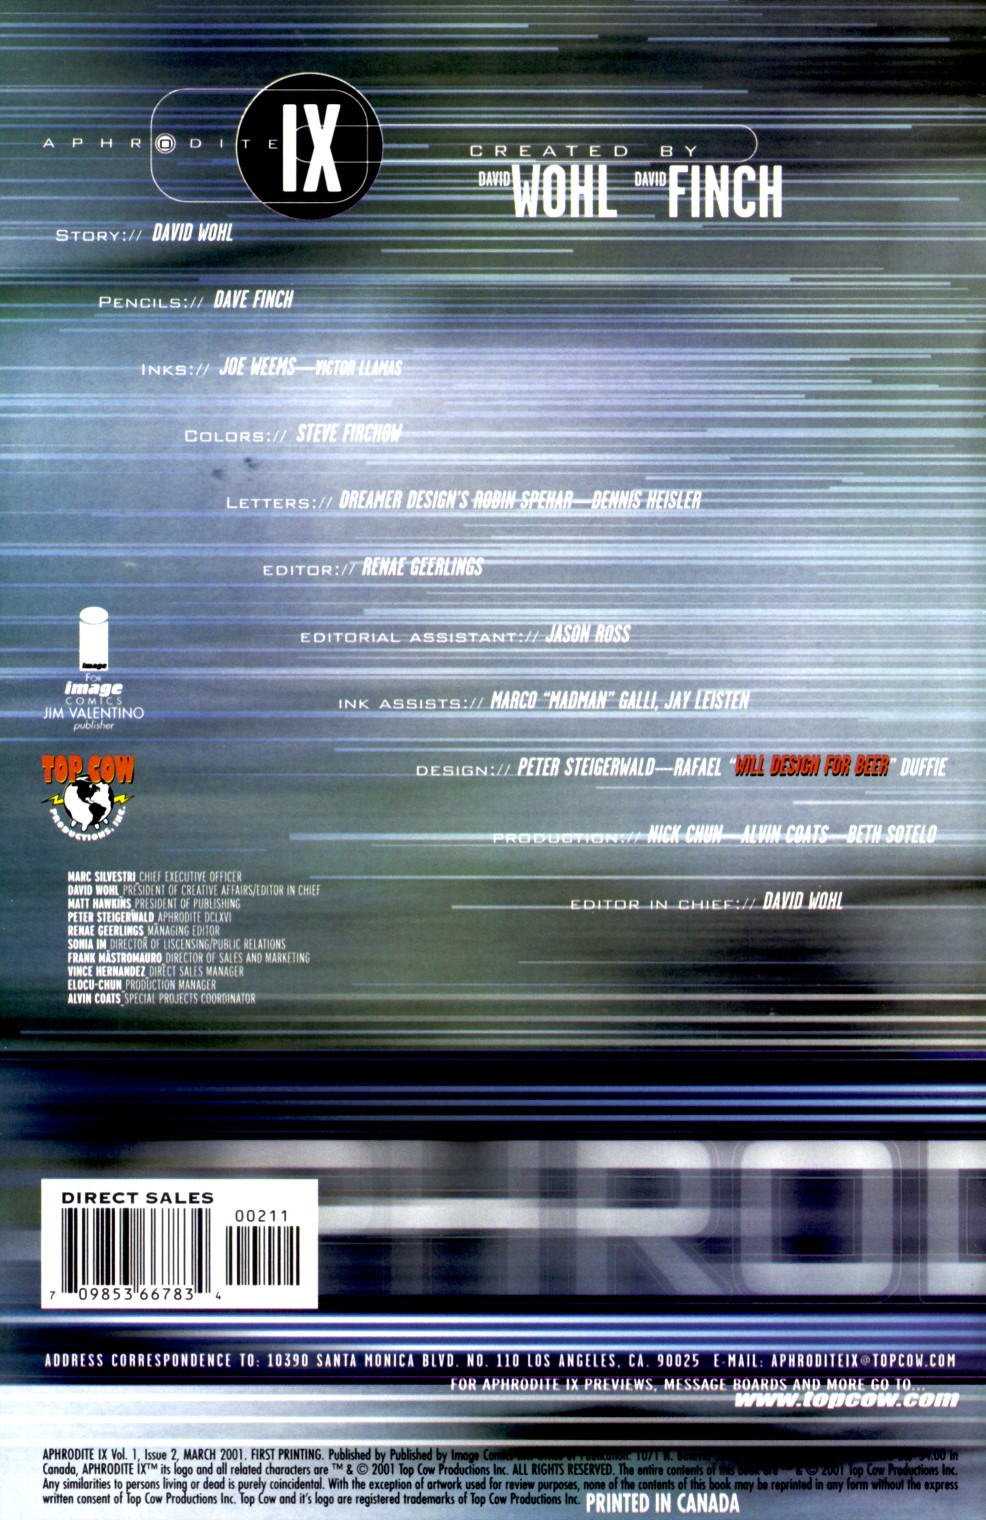 Read online Aphrodite IX (2000) comic -  Issue #2 - 3